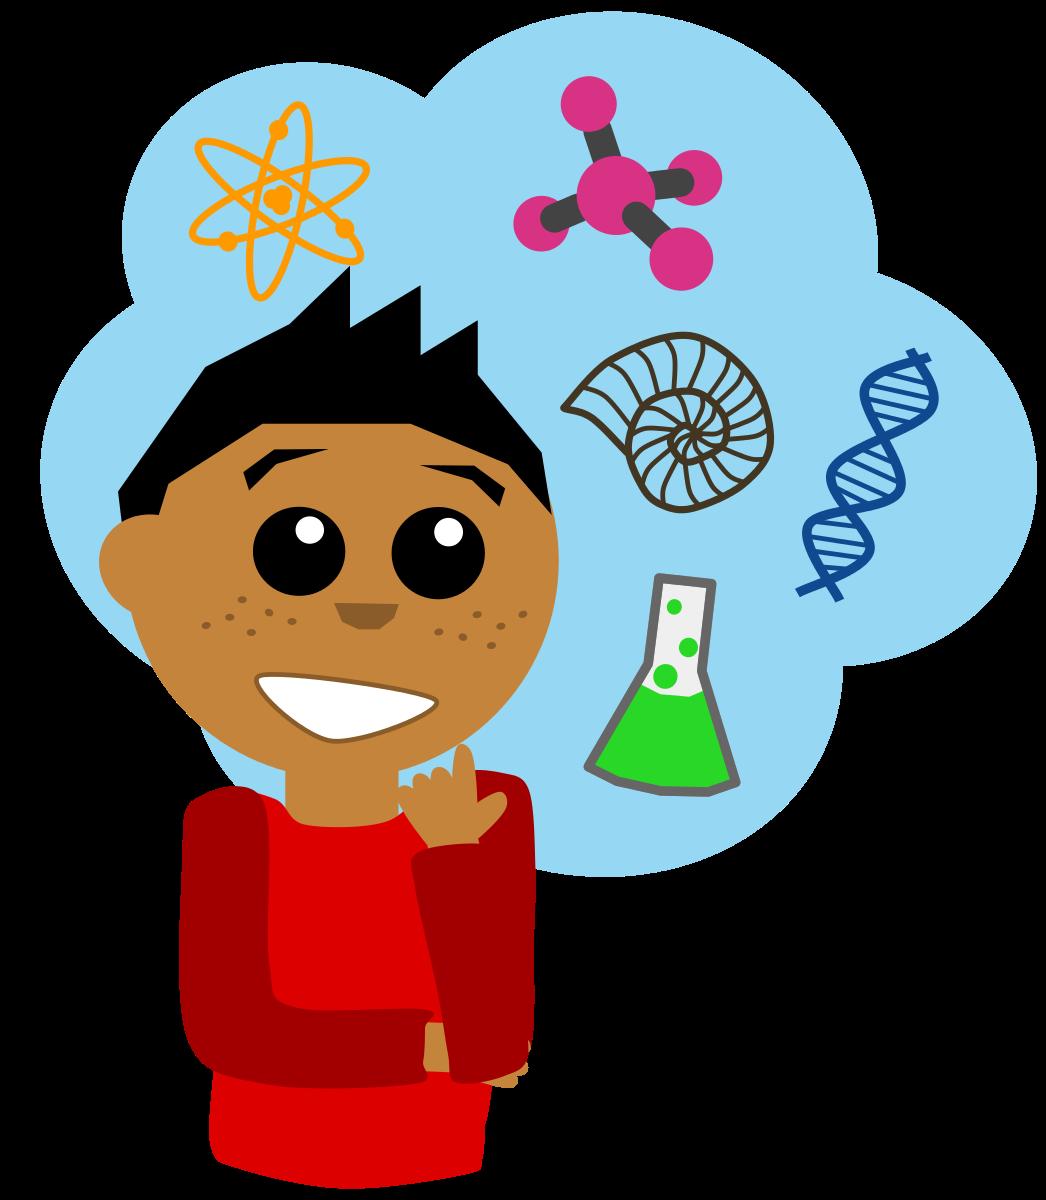 Thinking scientist. Clipart scientific